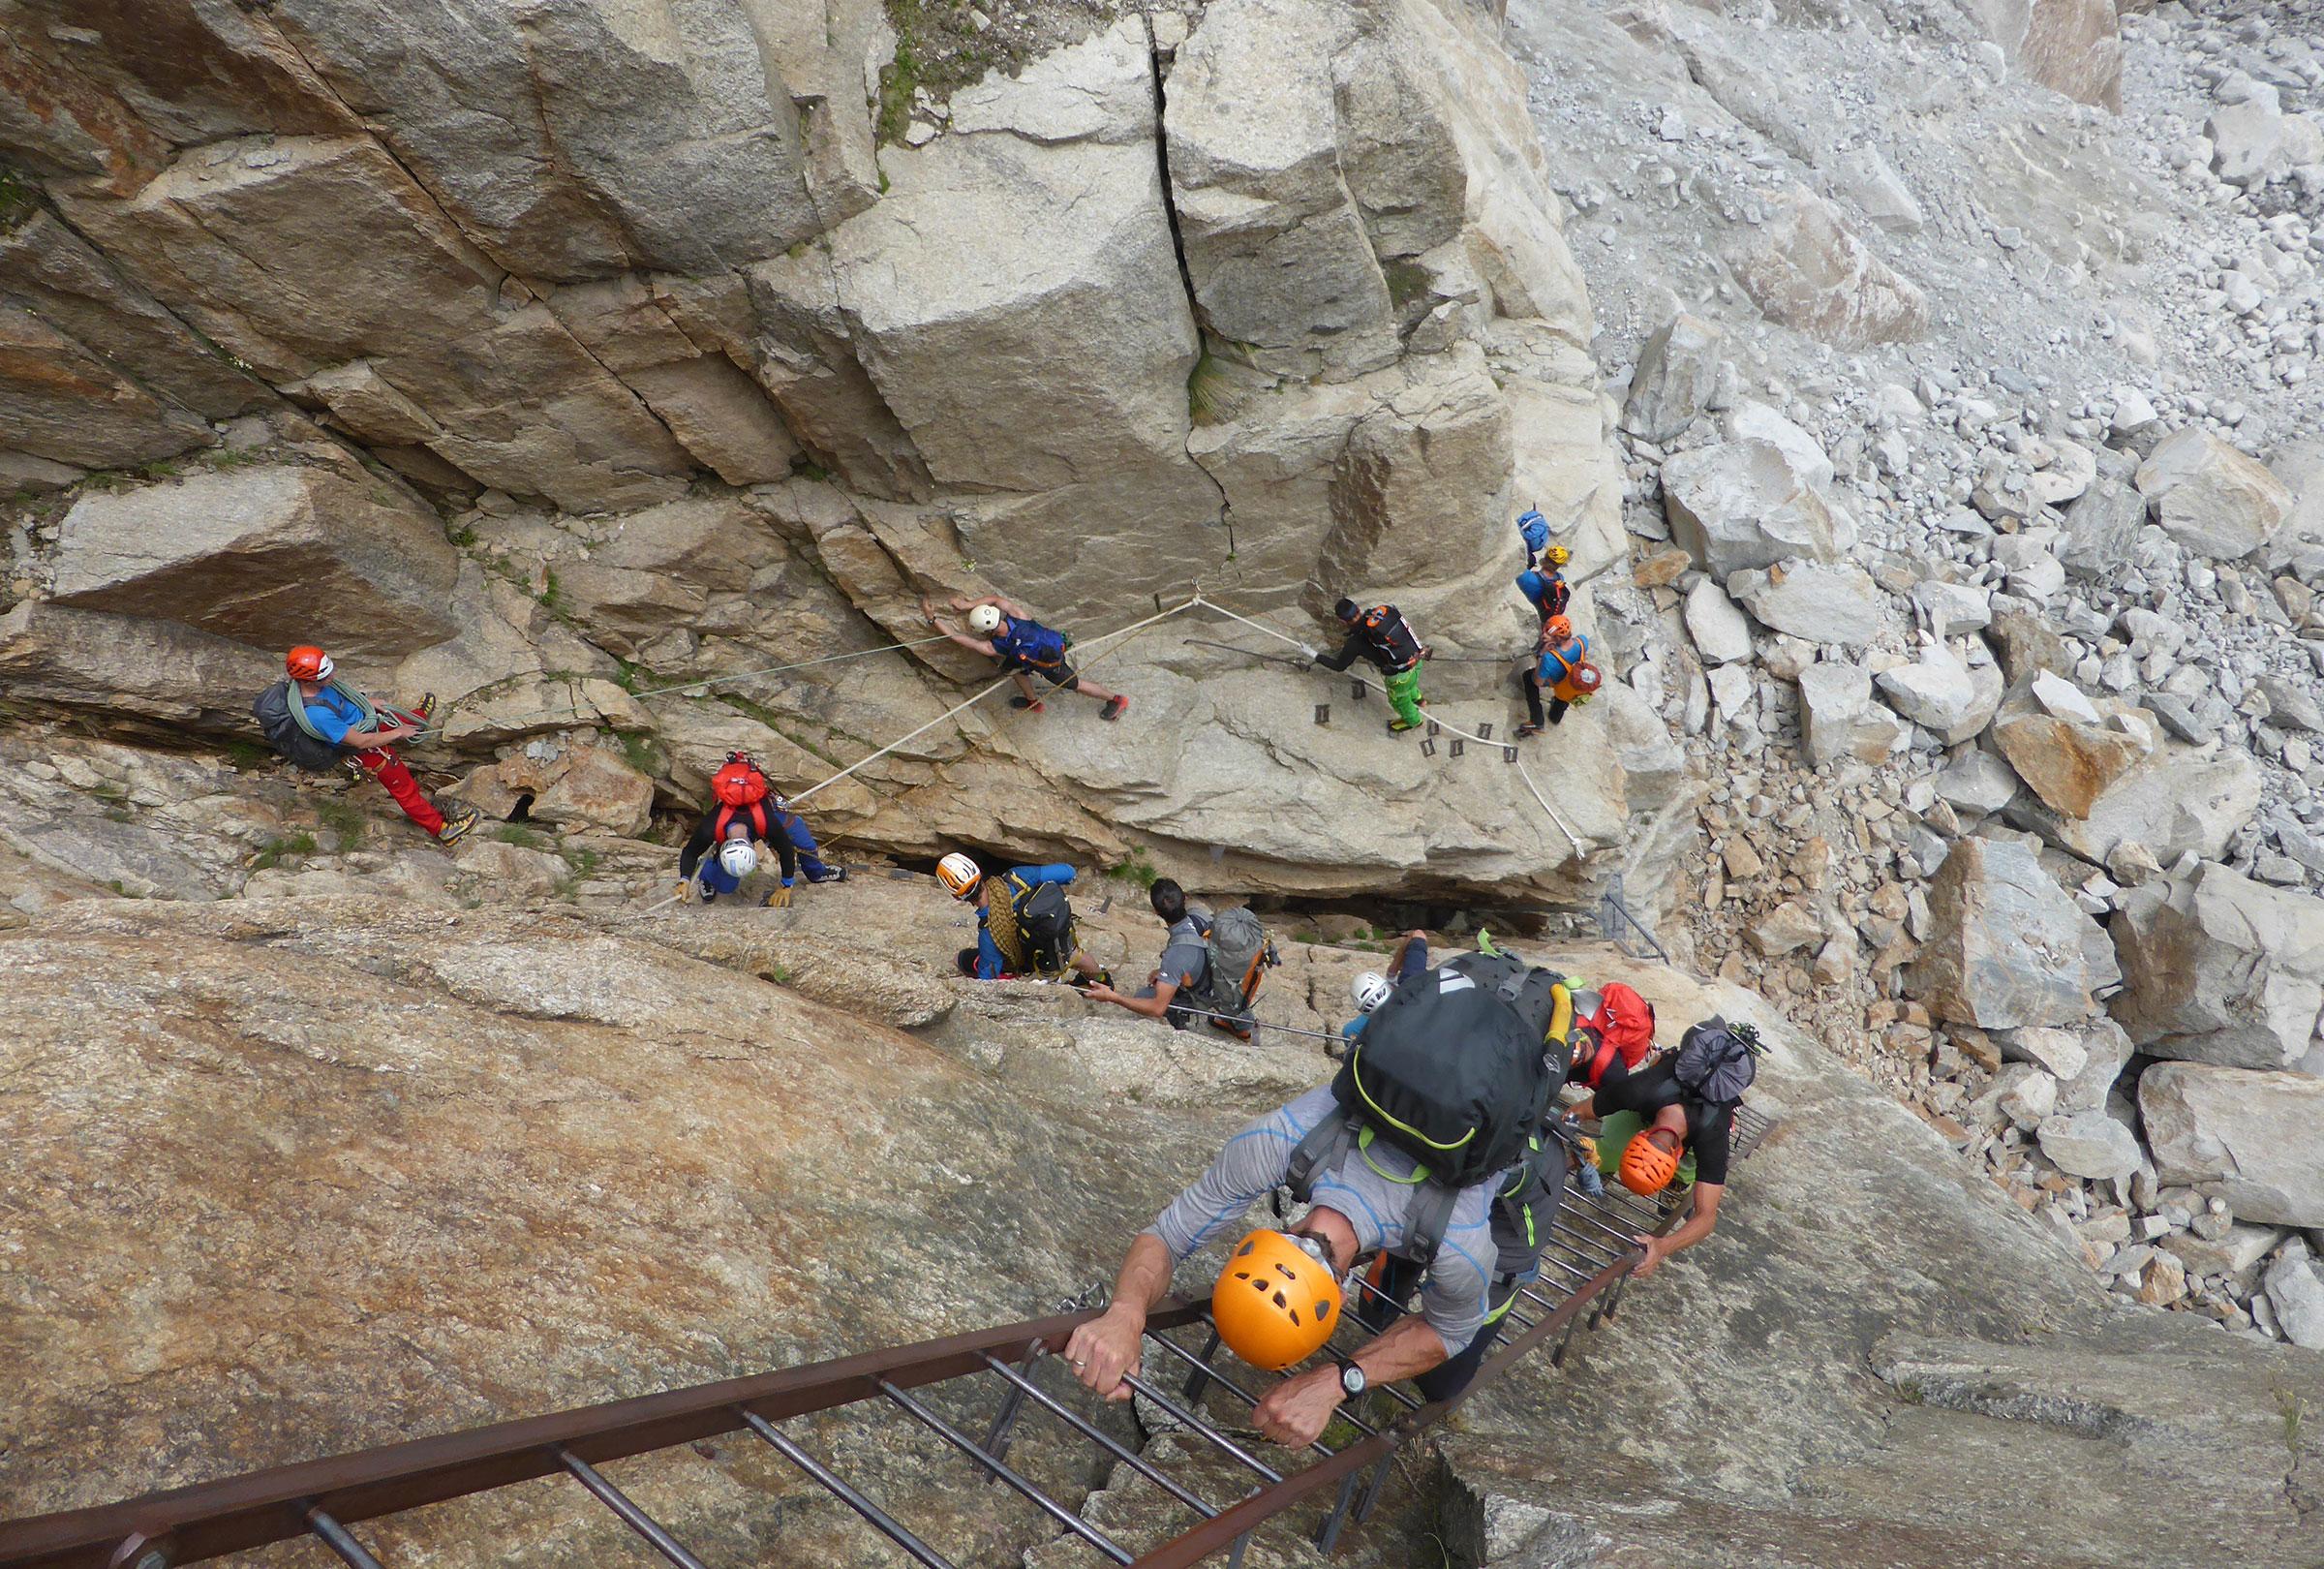 Klettersteig Huterlaner : Klettersteige zillertal christoph garber bergfÜhrer